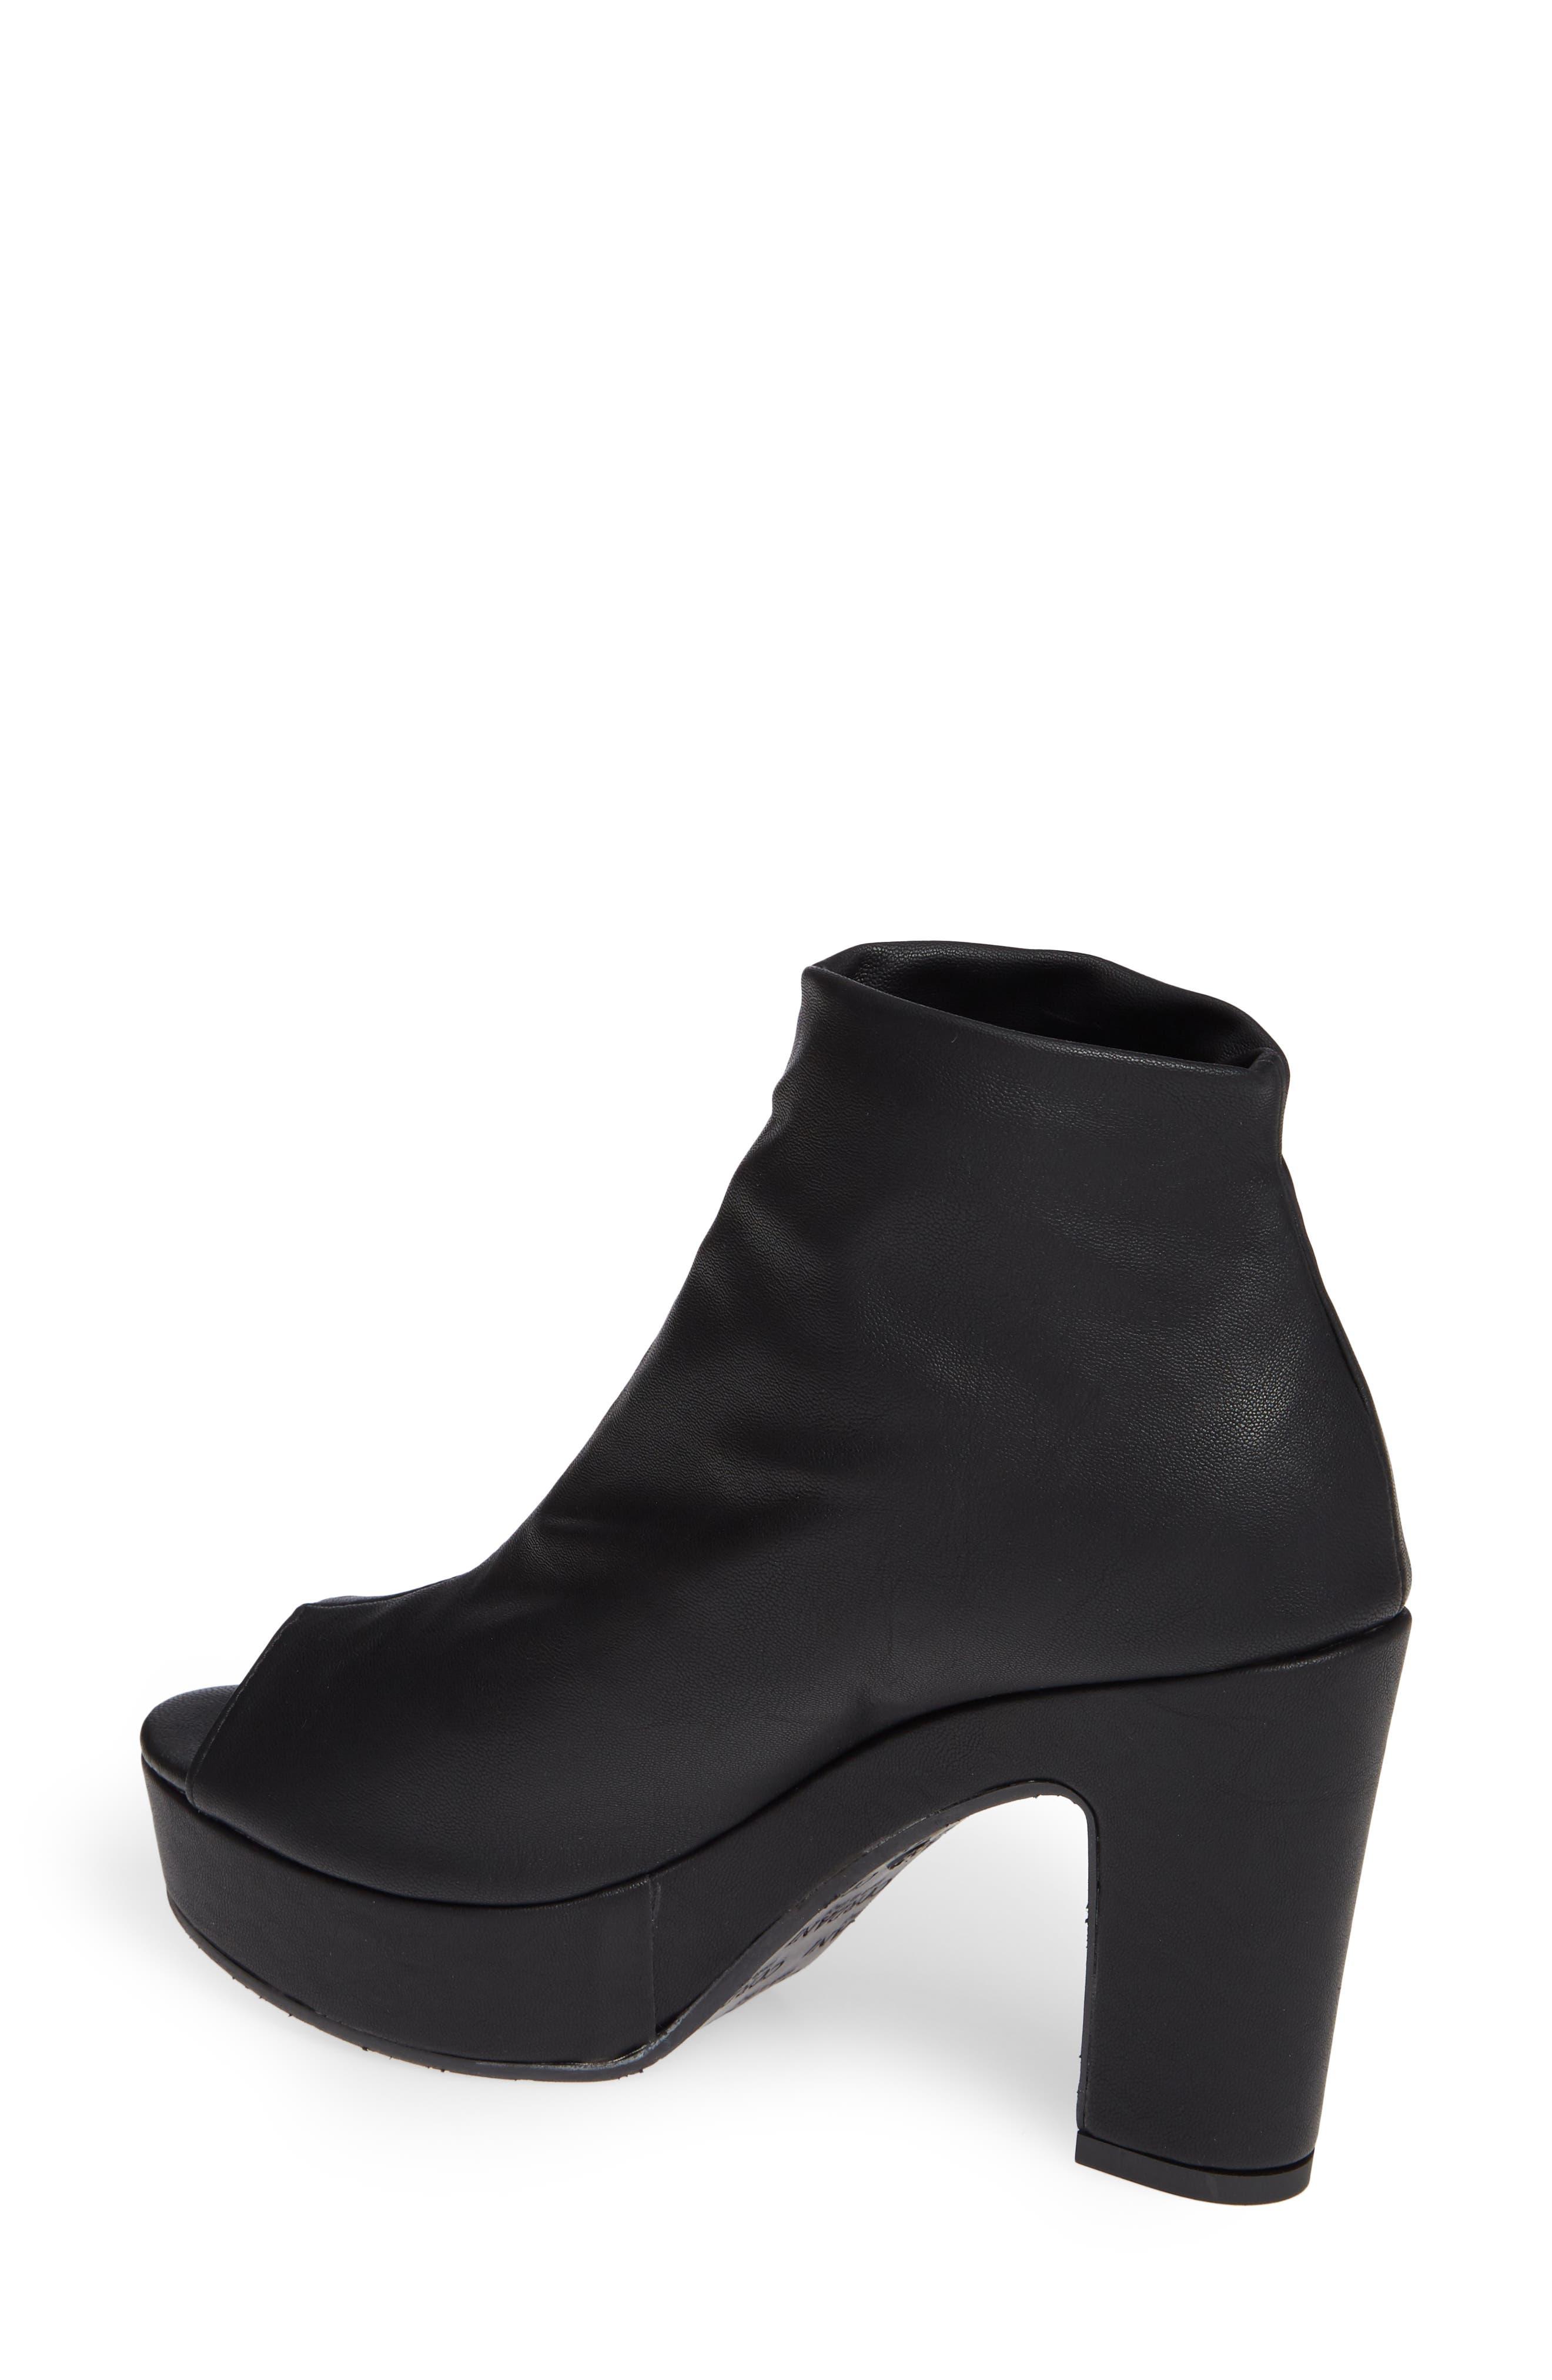 Tyra Peep Toe Platform Bootie,                             Alternate thumbnail 2, color,                             Black Fabric